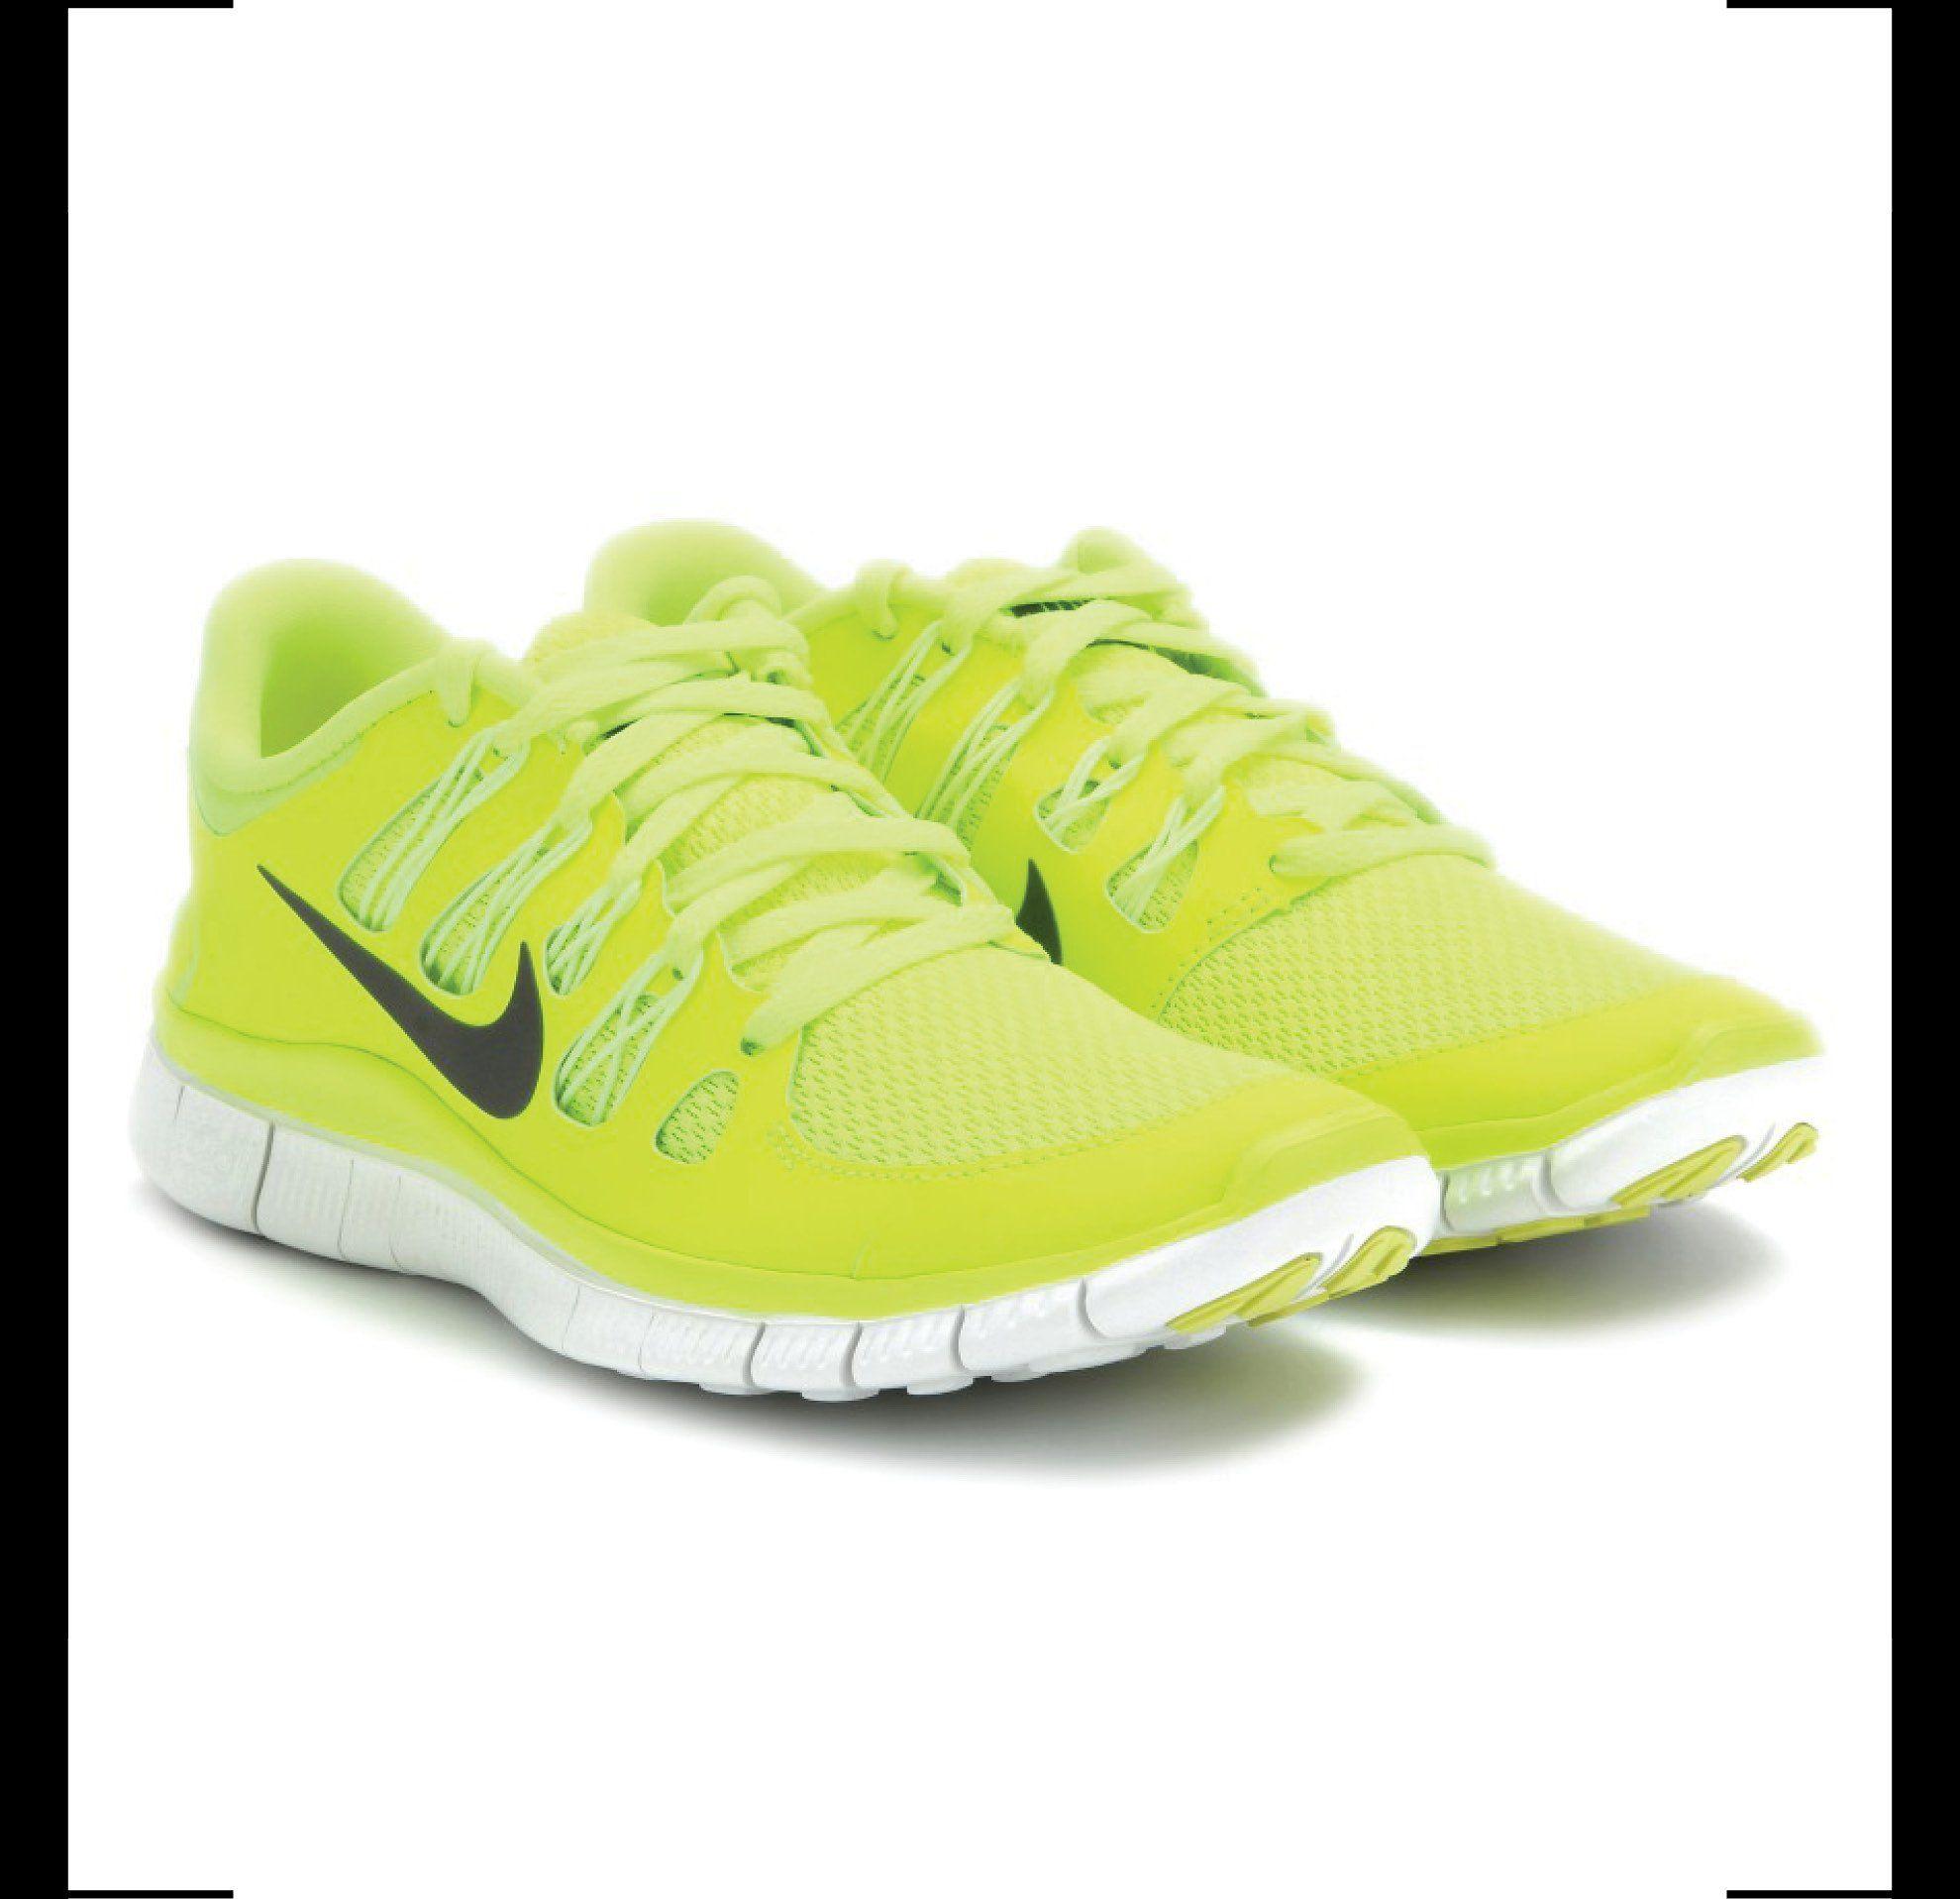 Free 5.0 sneakers, Nike free, Nike